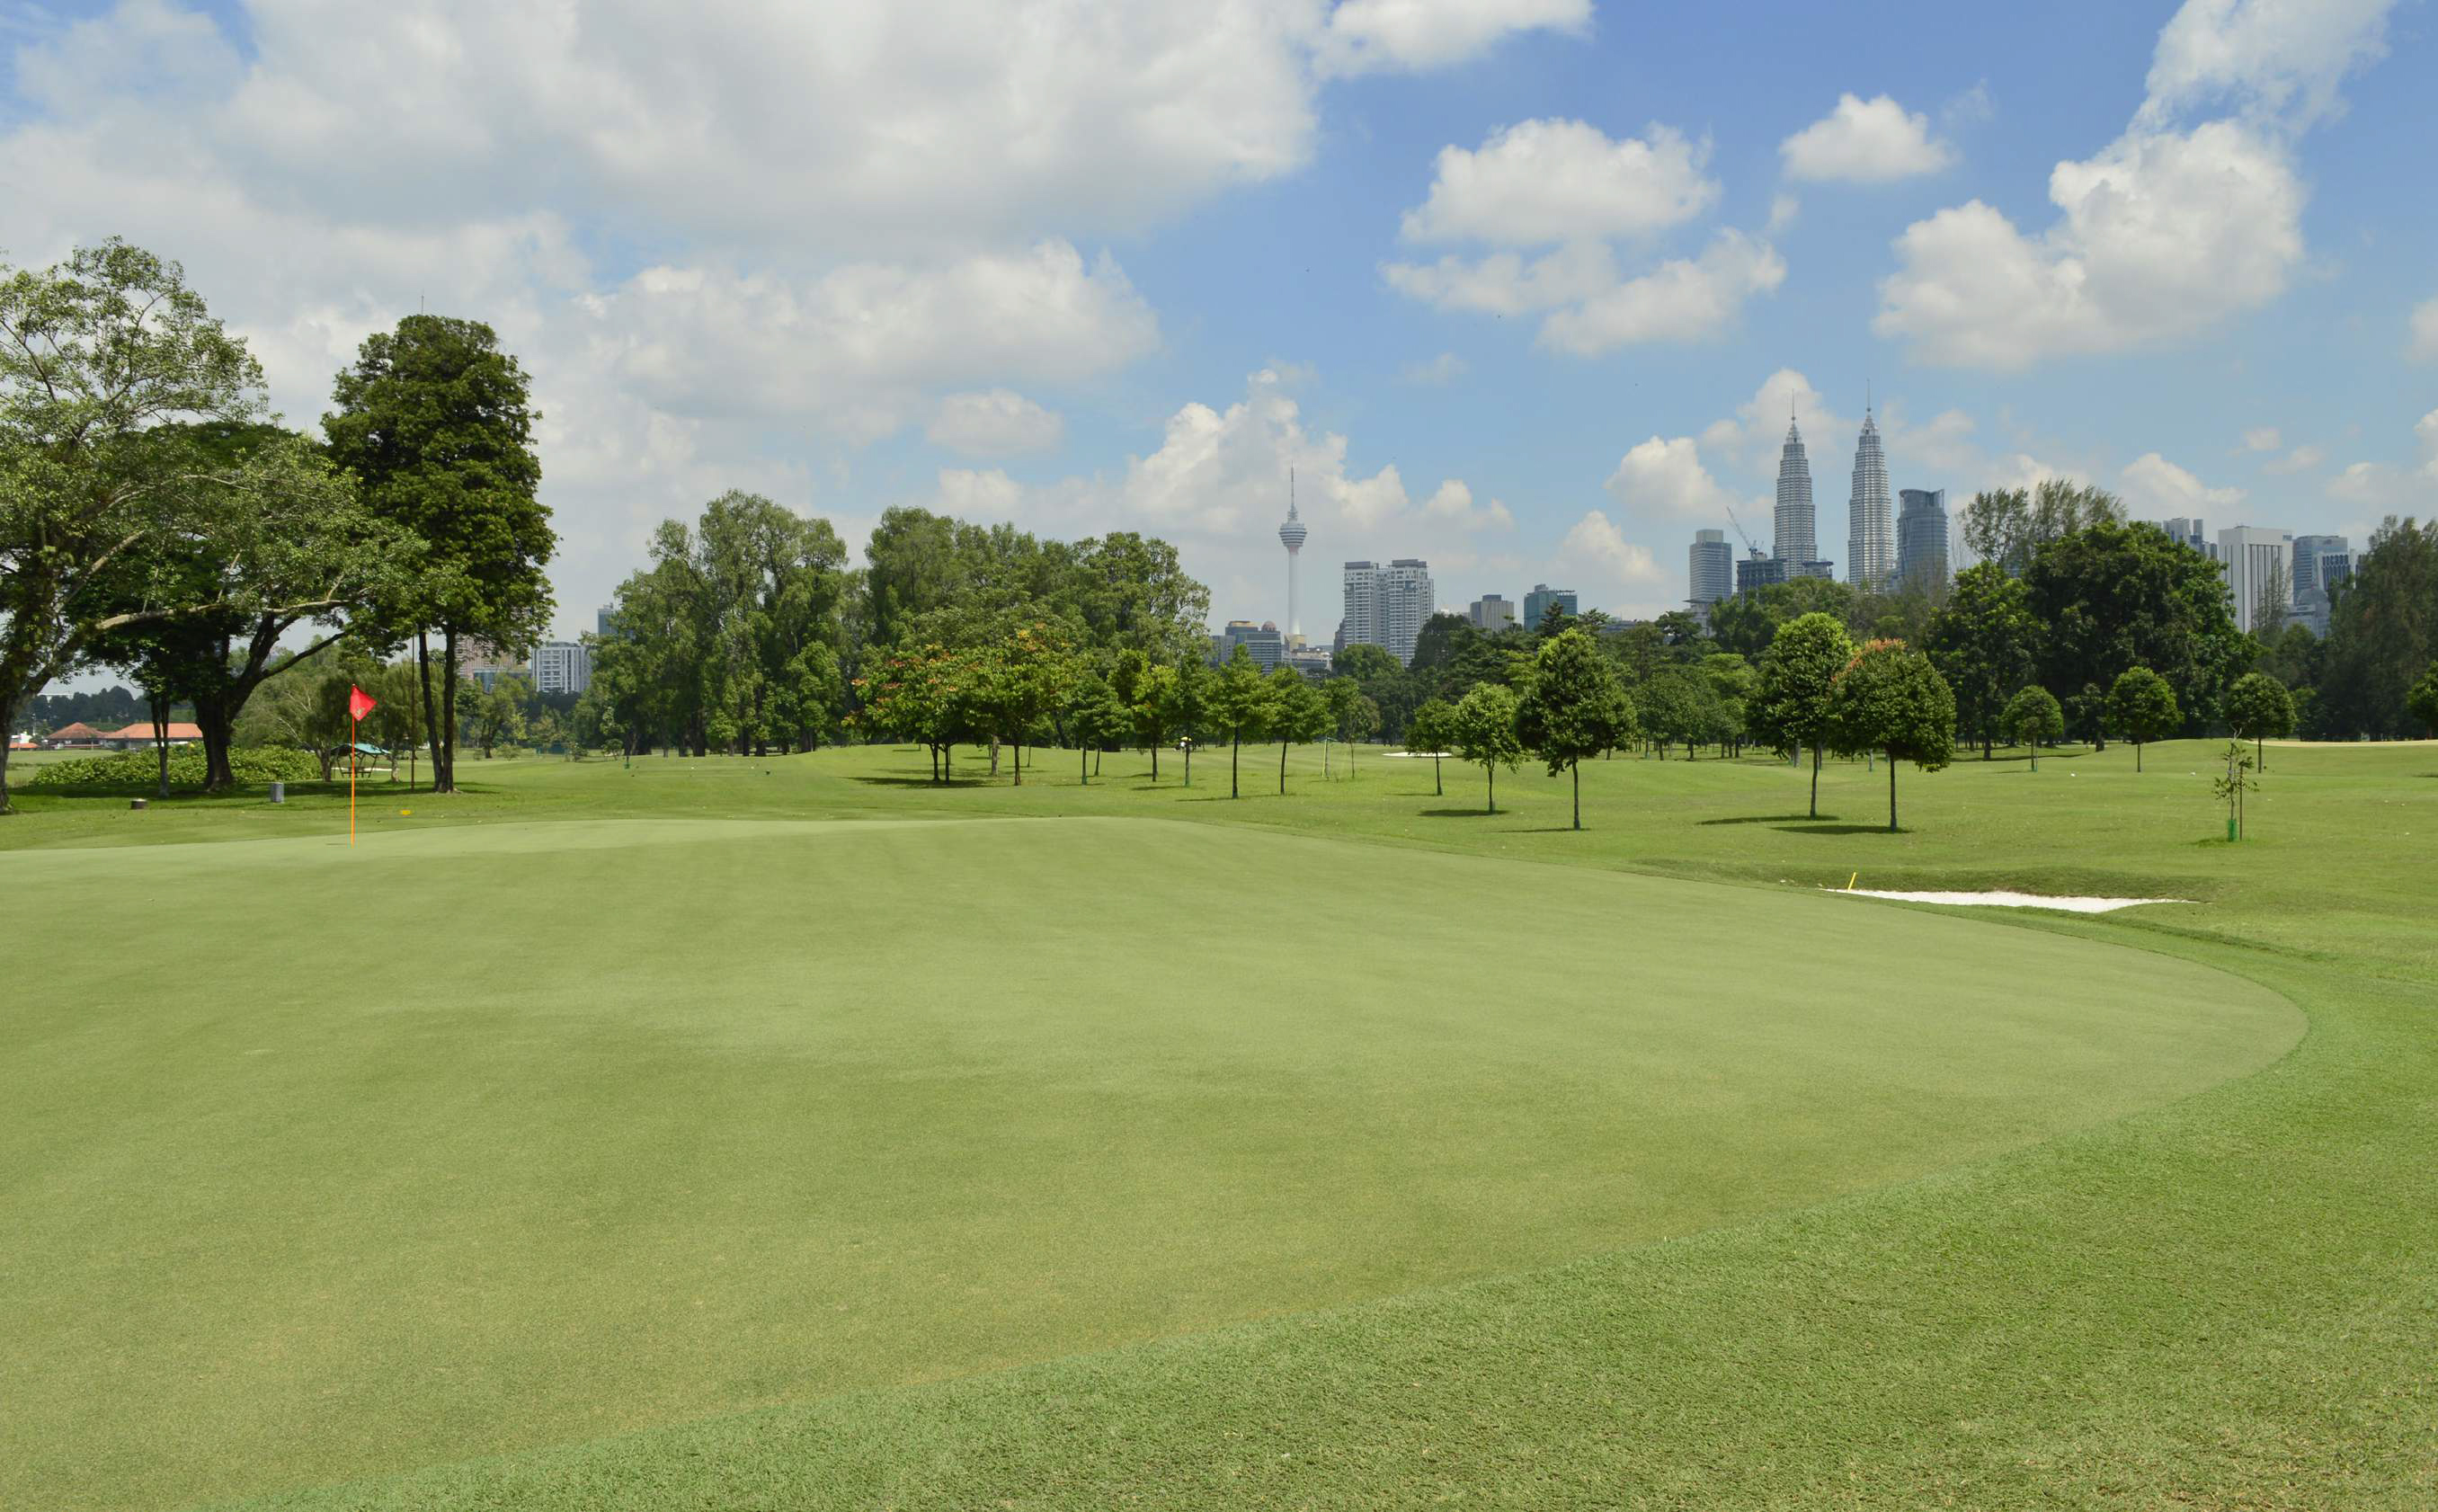 Asia, 5 campi da golf urbani